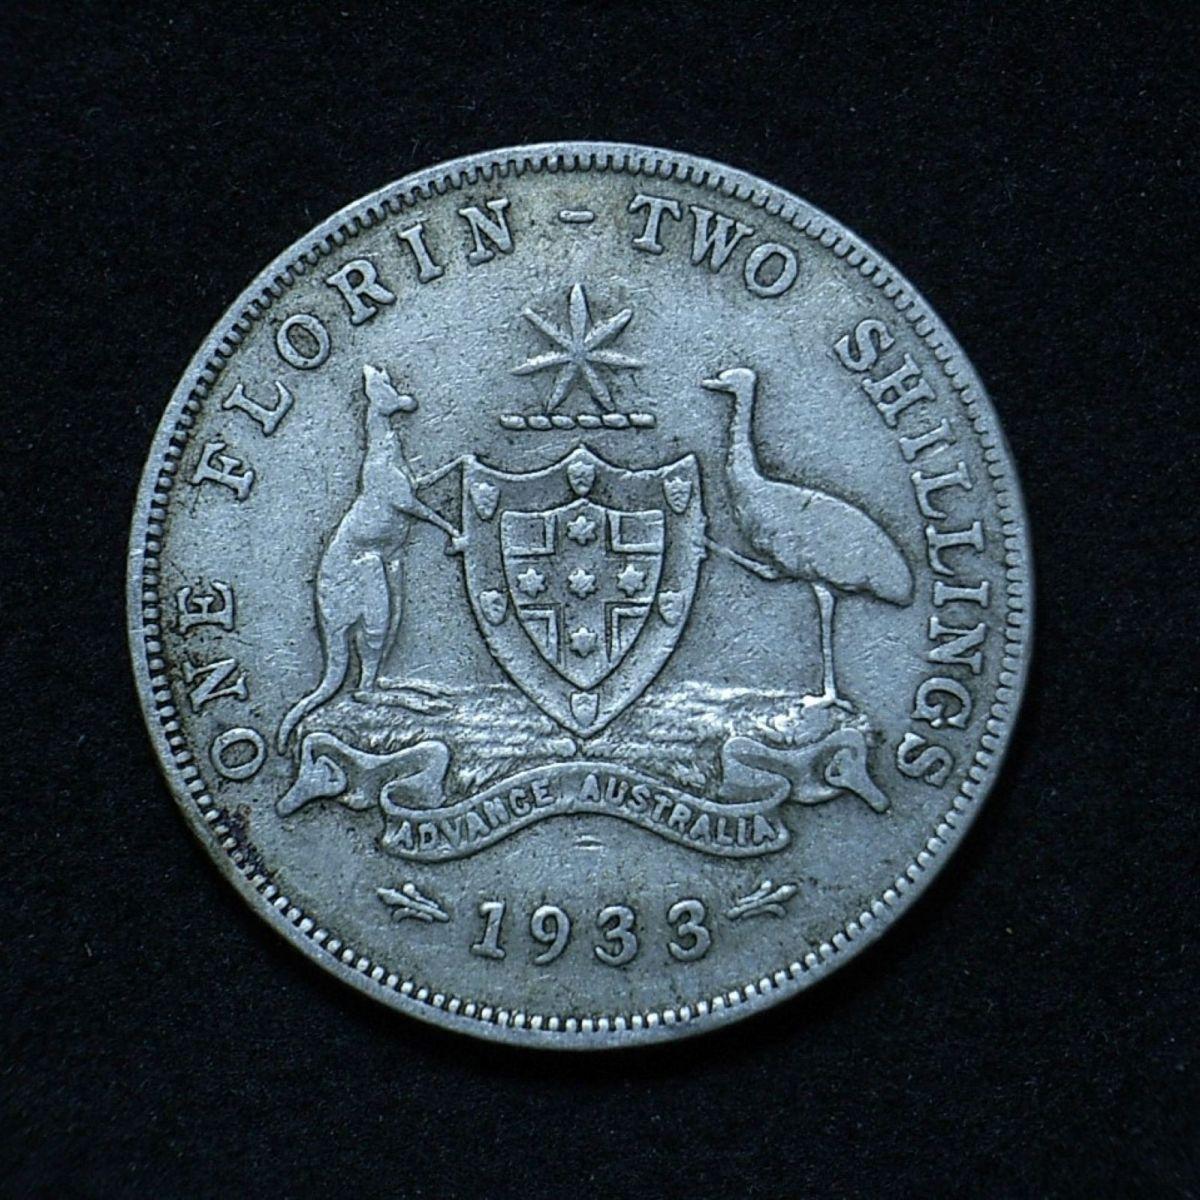 Aussie 1933 florin reverse close up